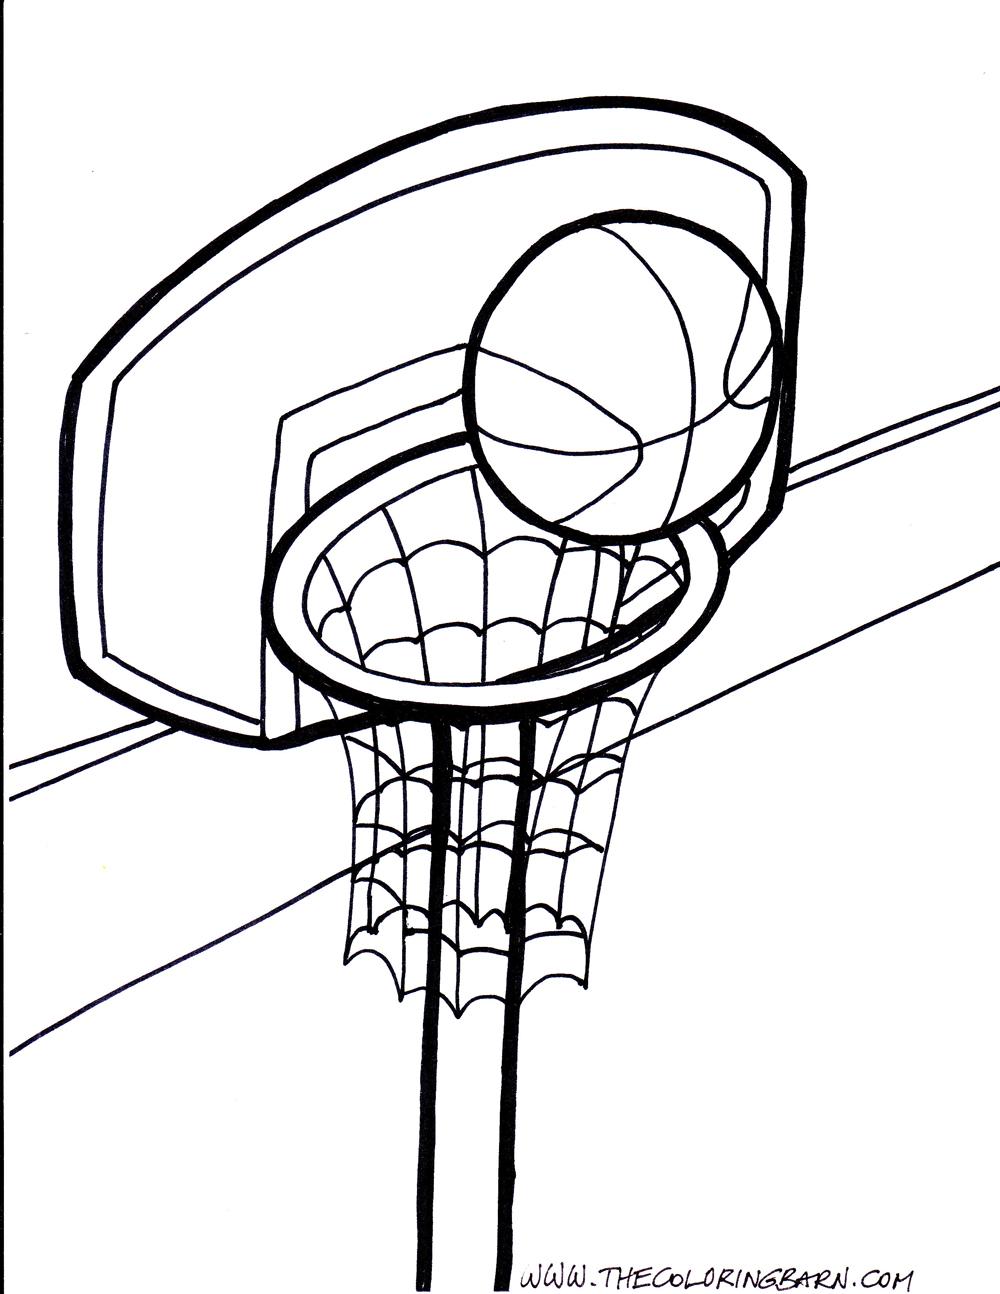 basketball drawing ideas at getdrawings  free download